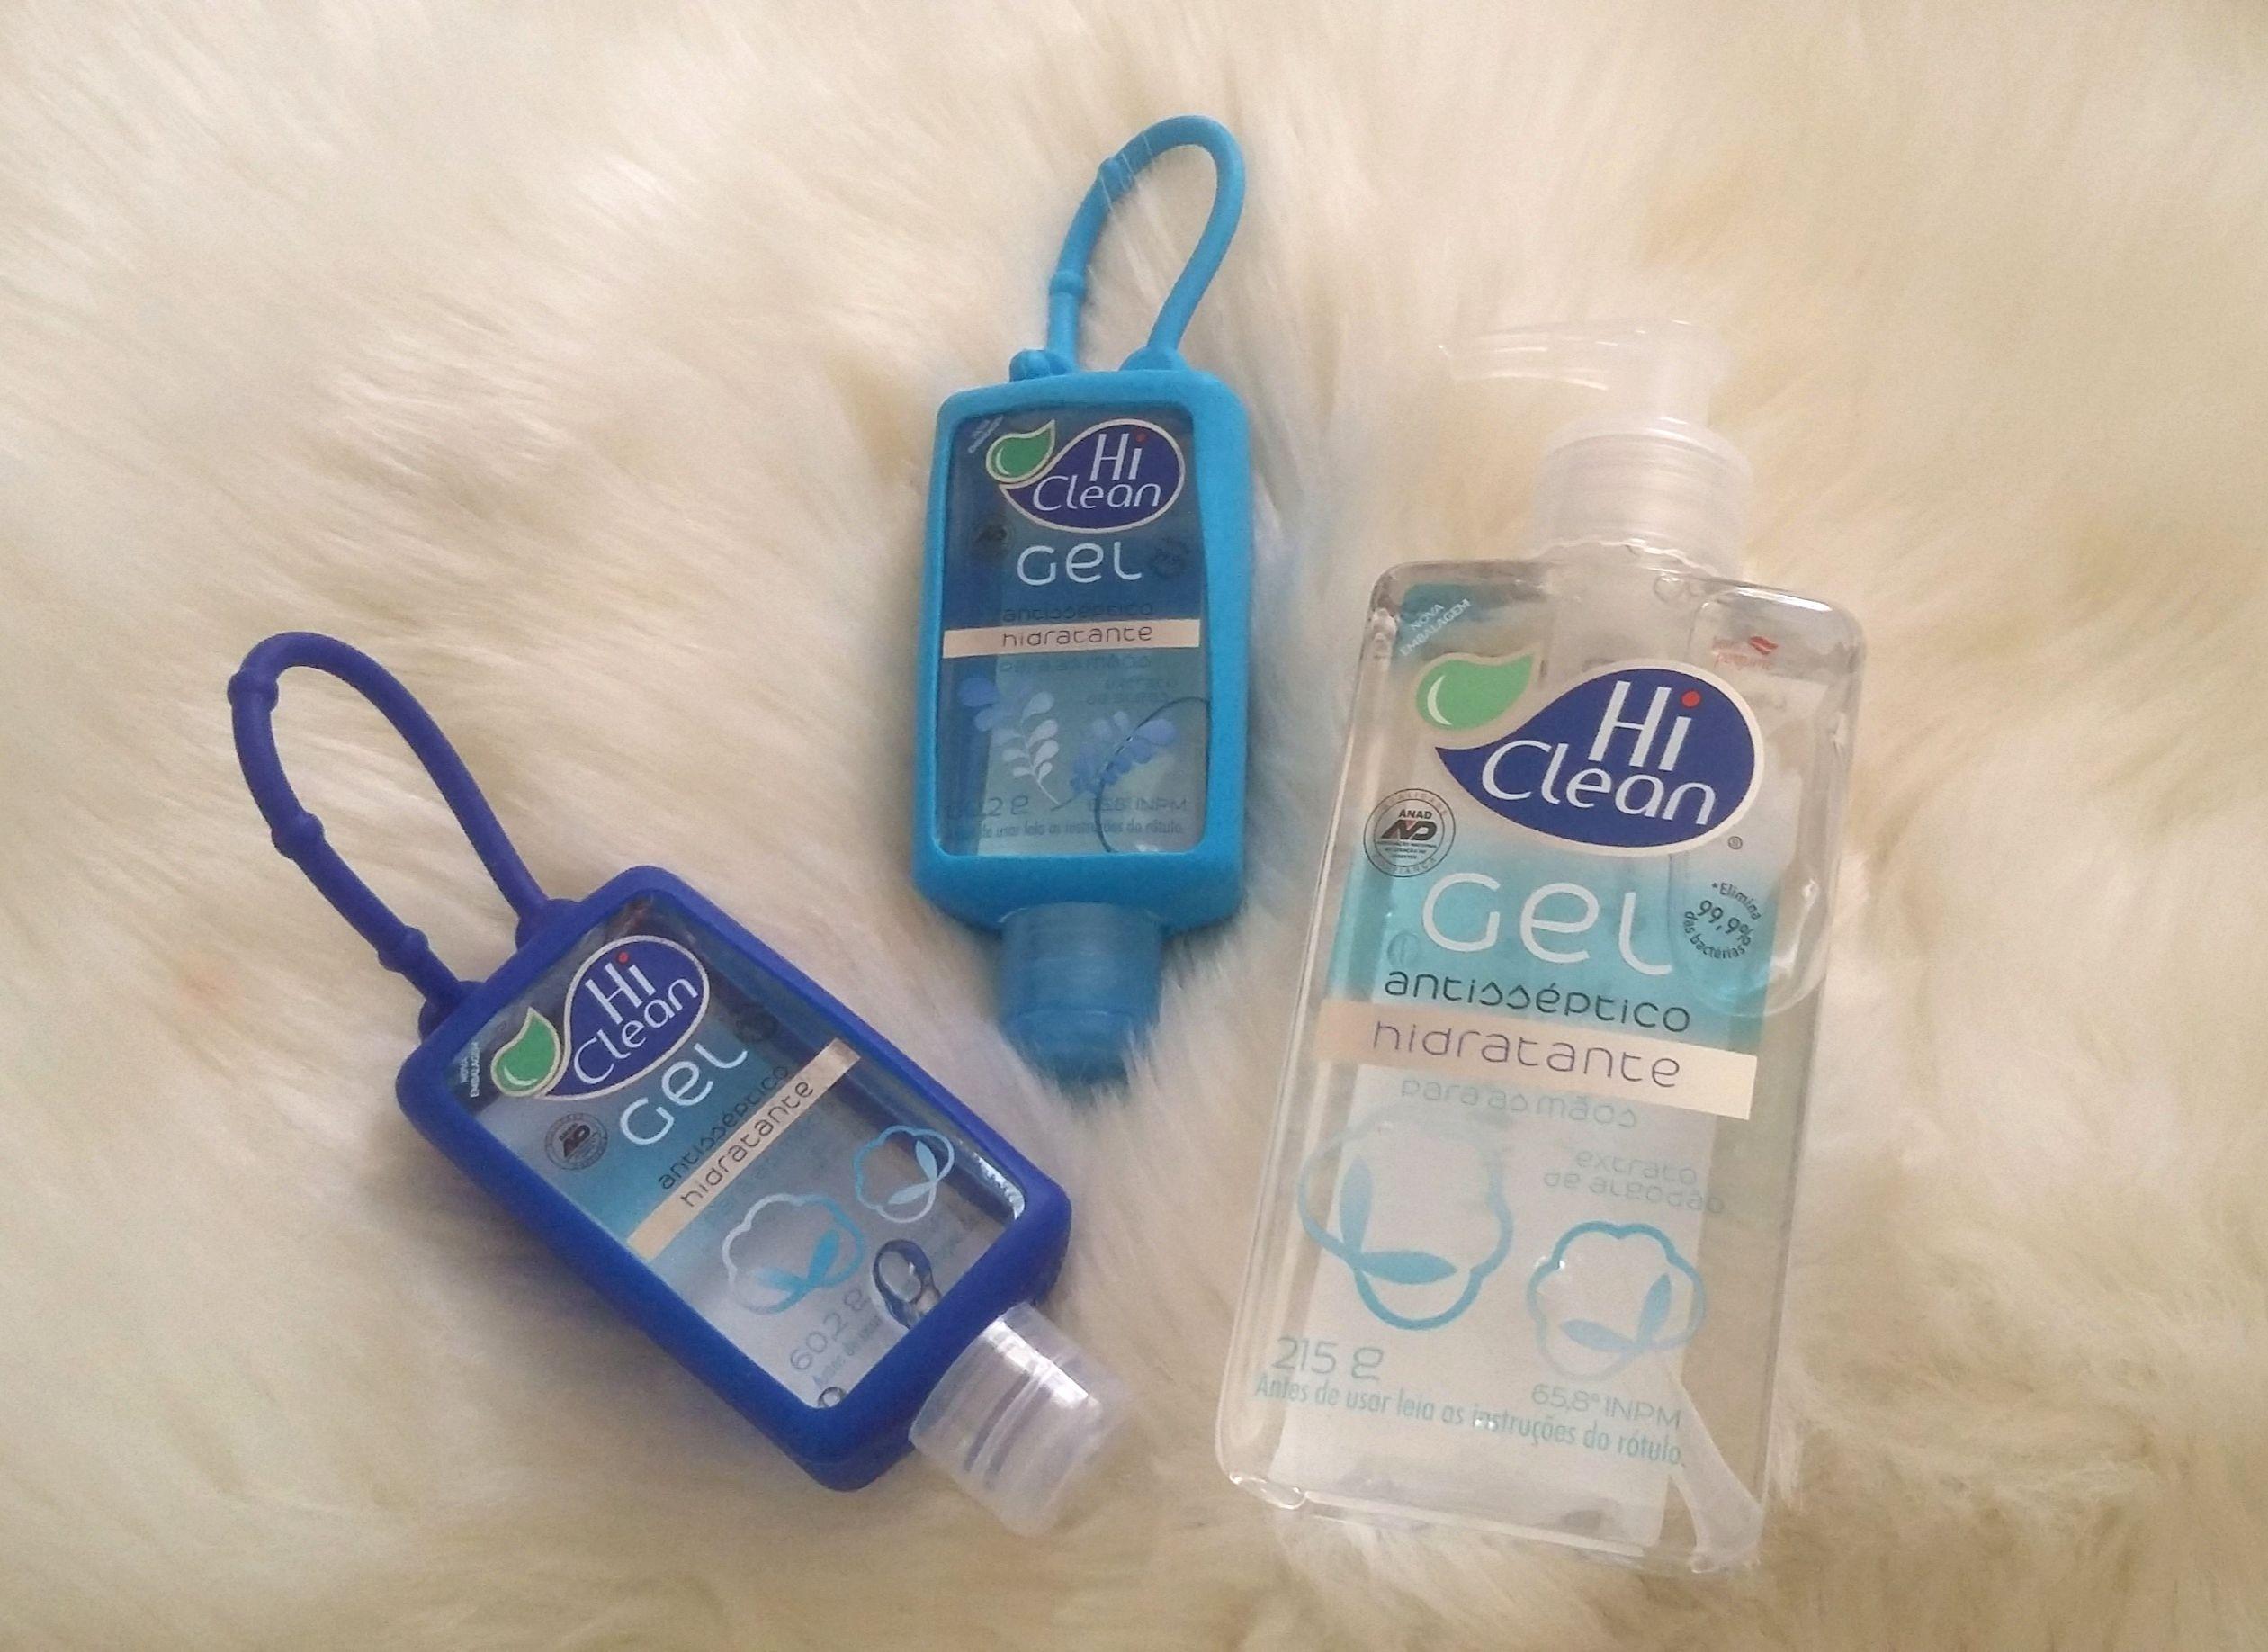 HI CLEAN gel antisséptico